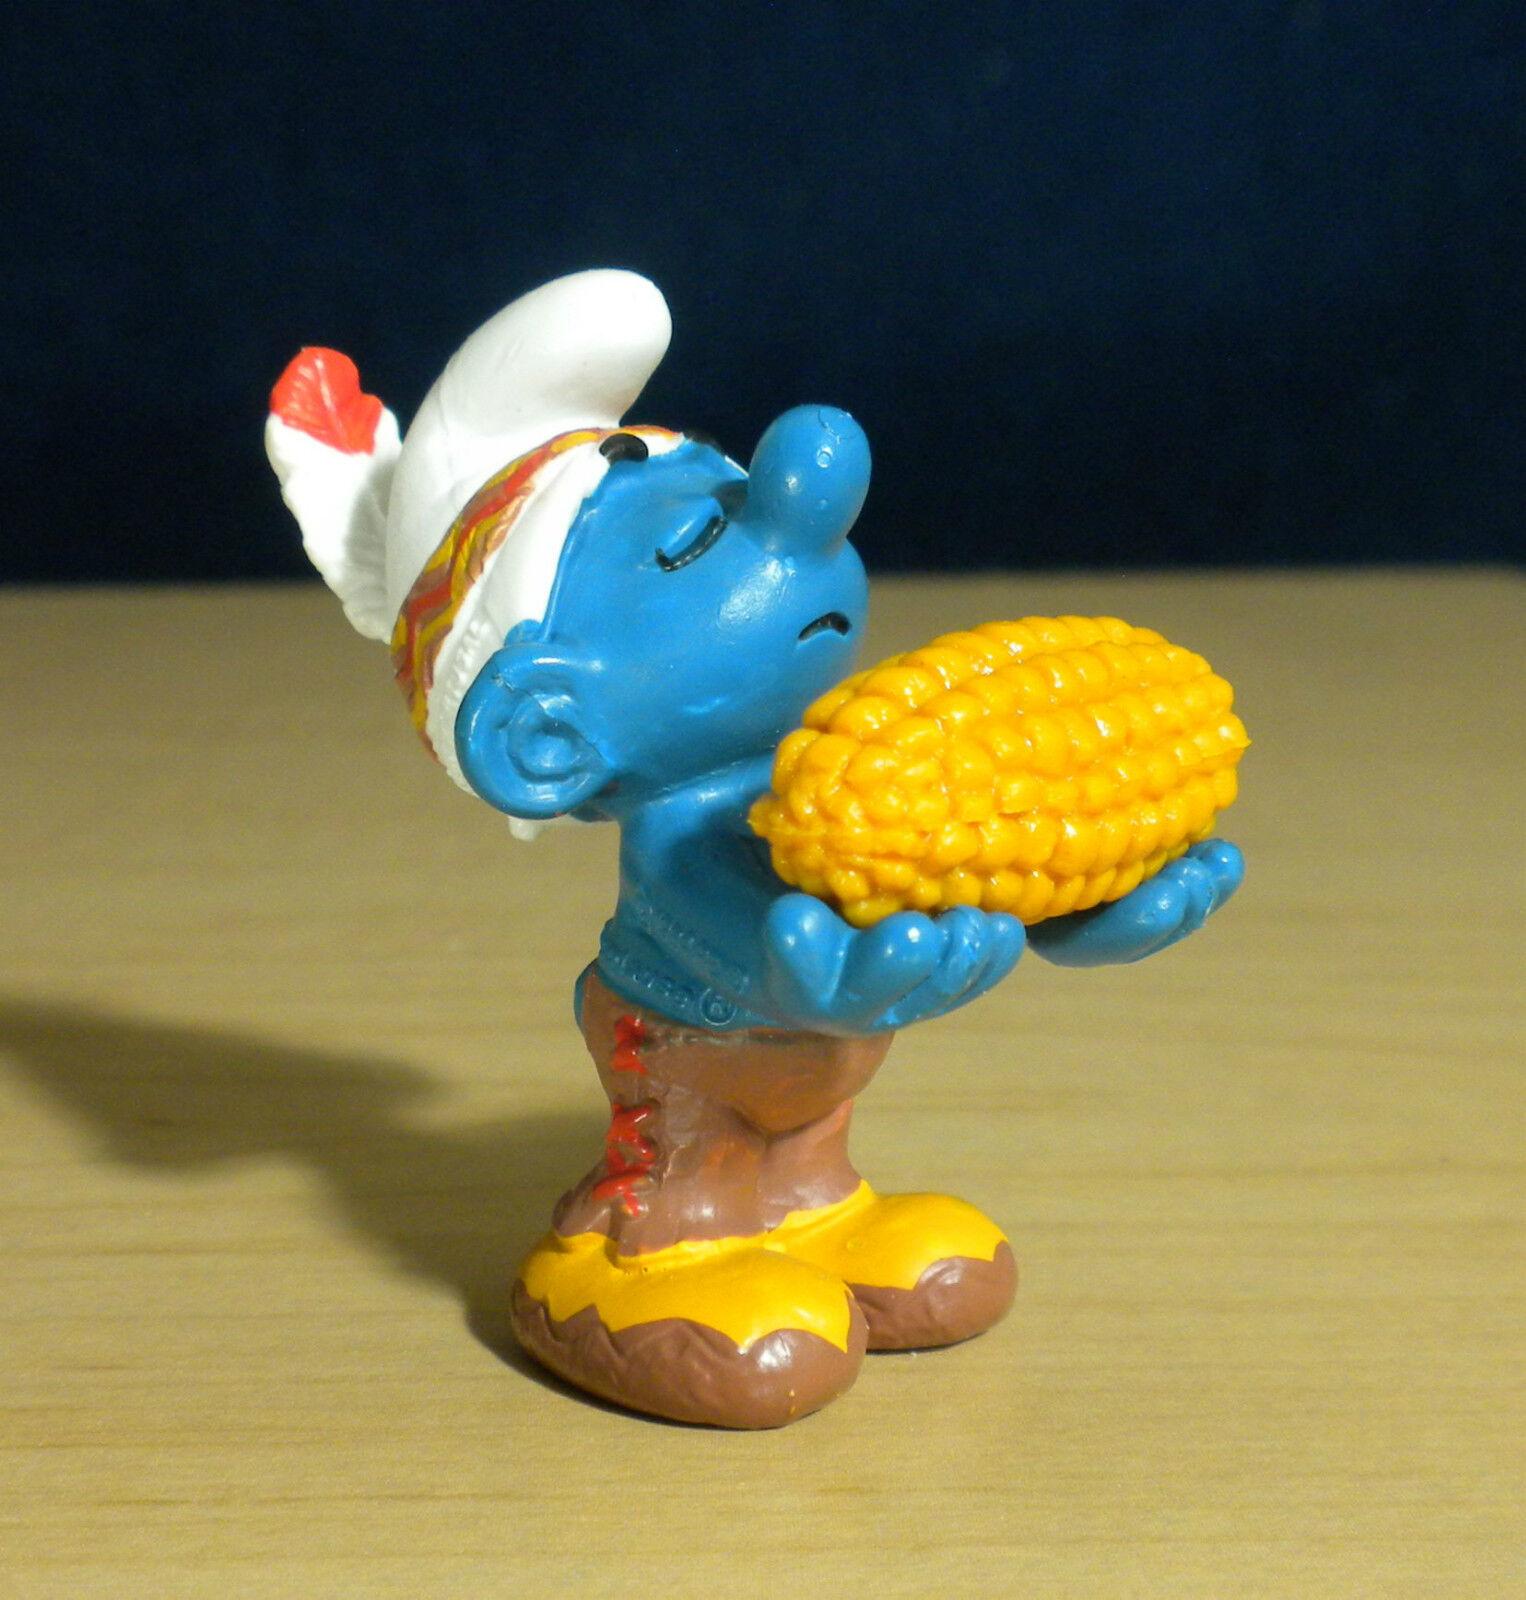 Smurfs 20197 Thanksgiving Corn Smurf Indian Rare Vintage Figure Toy PVC Figurine